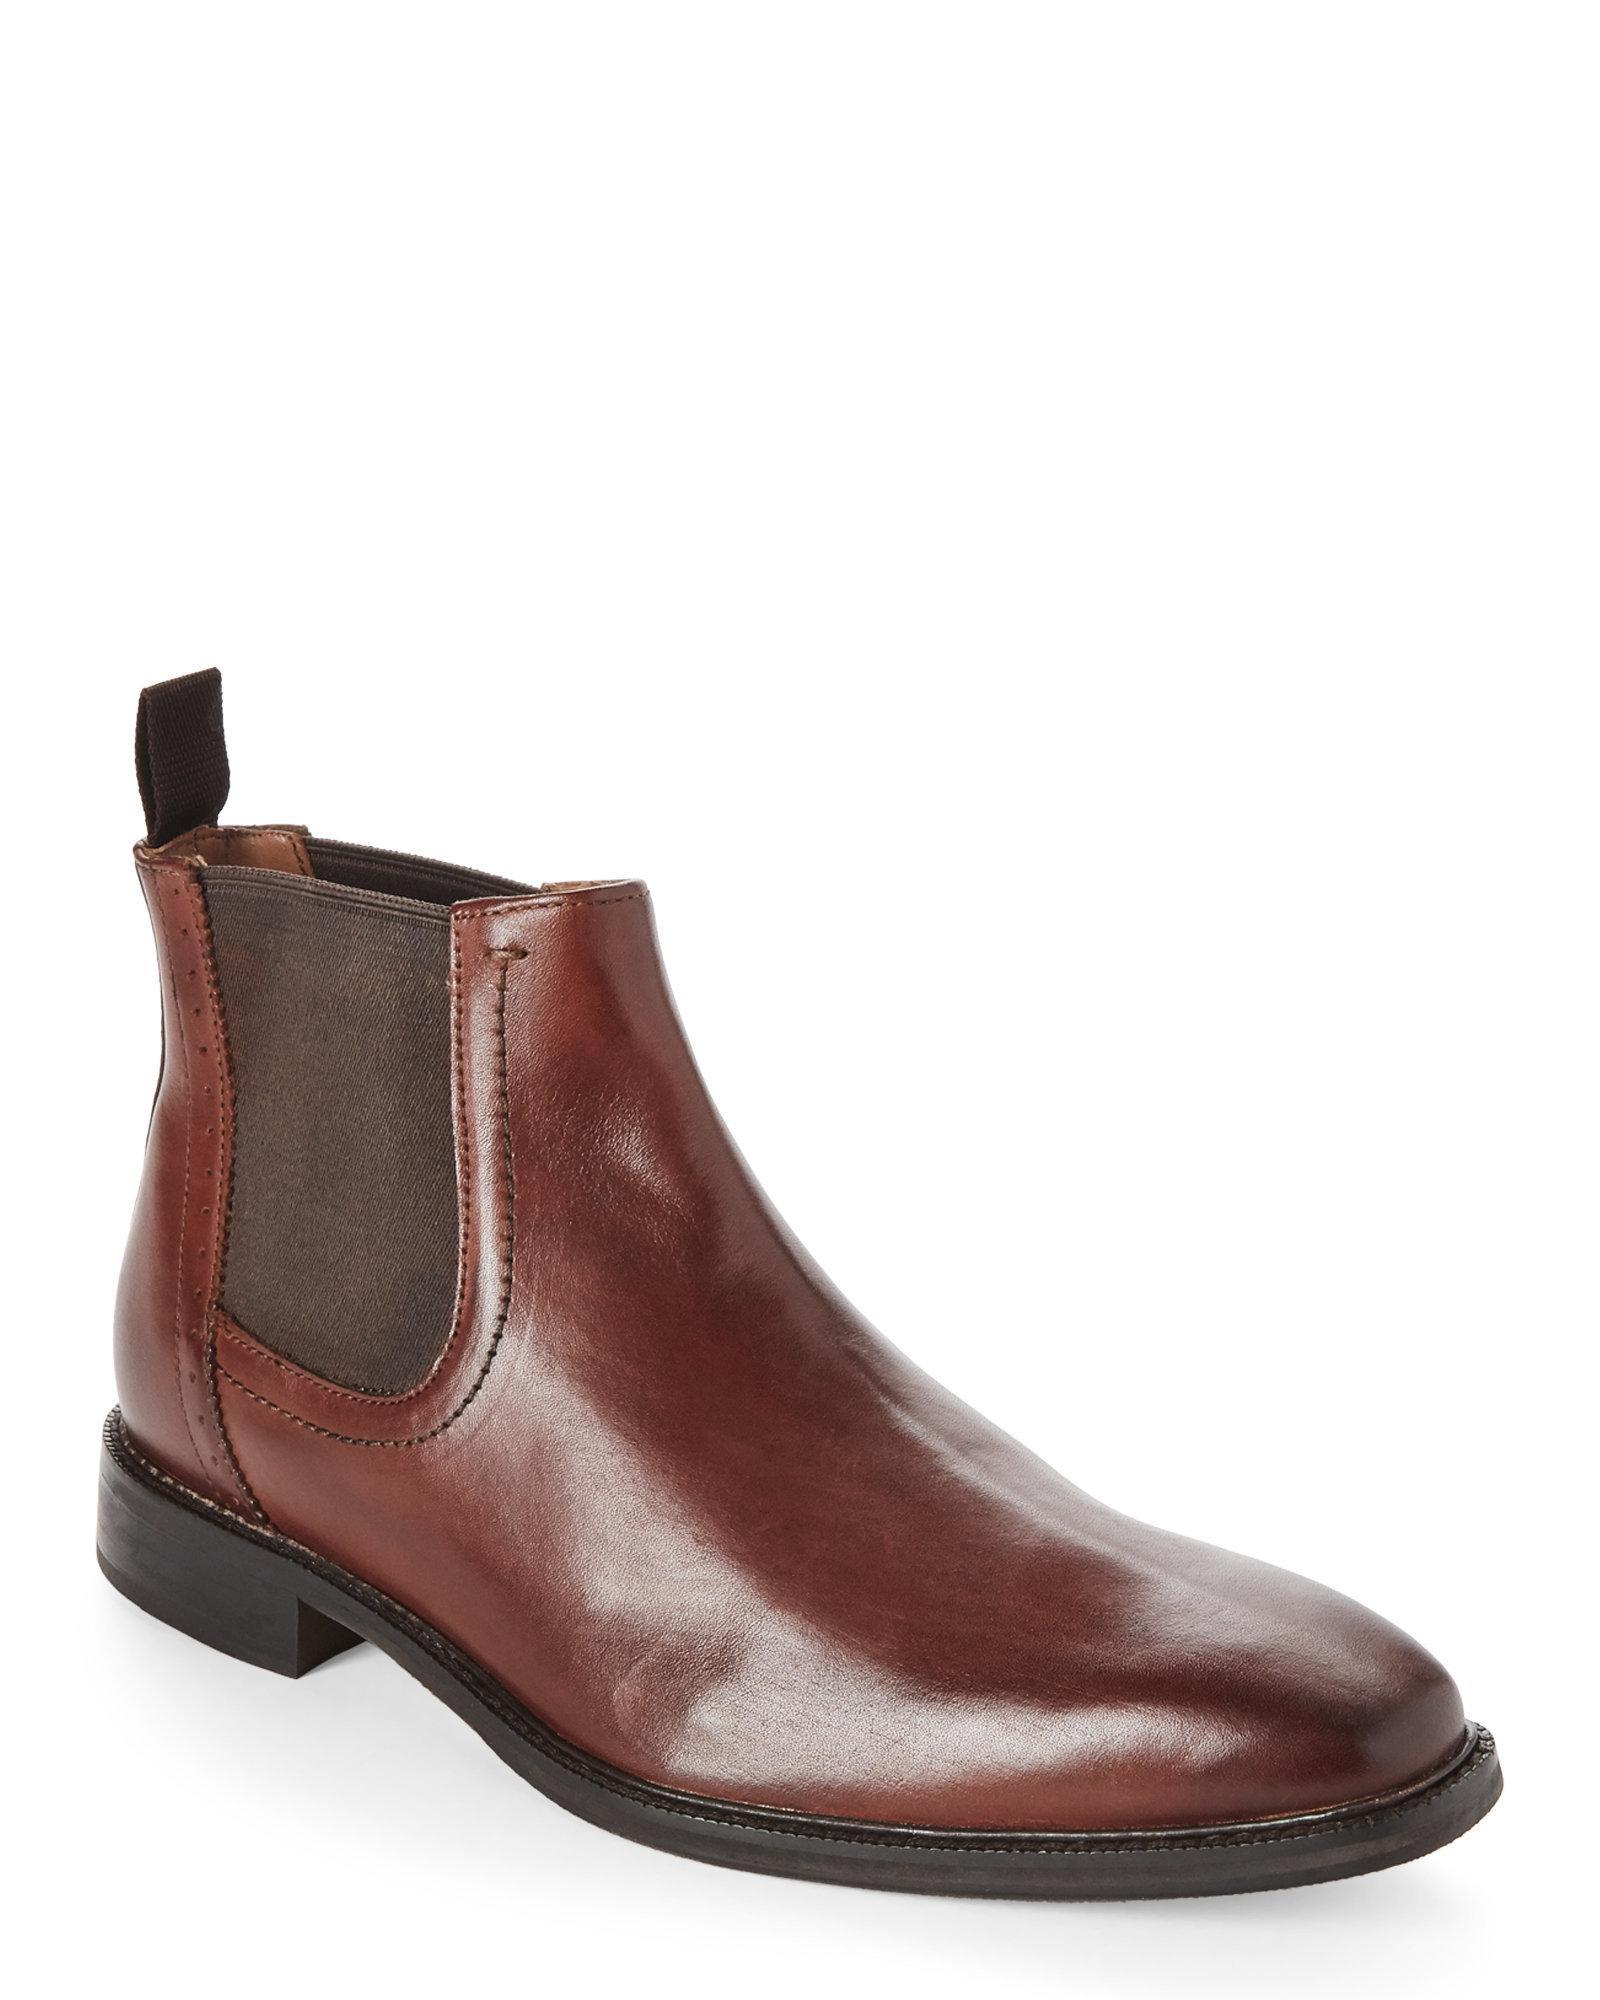 e862fbc54aed0c Lyst - Bacco Bucci Studio Tan Tangier Leather Chelsea Boots in Brown ...